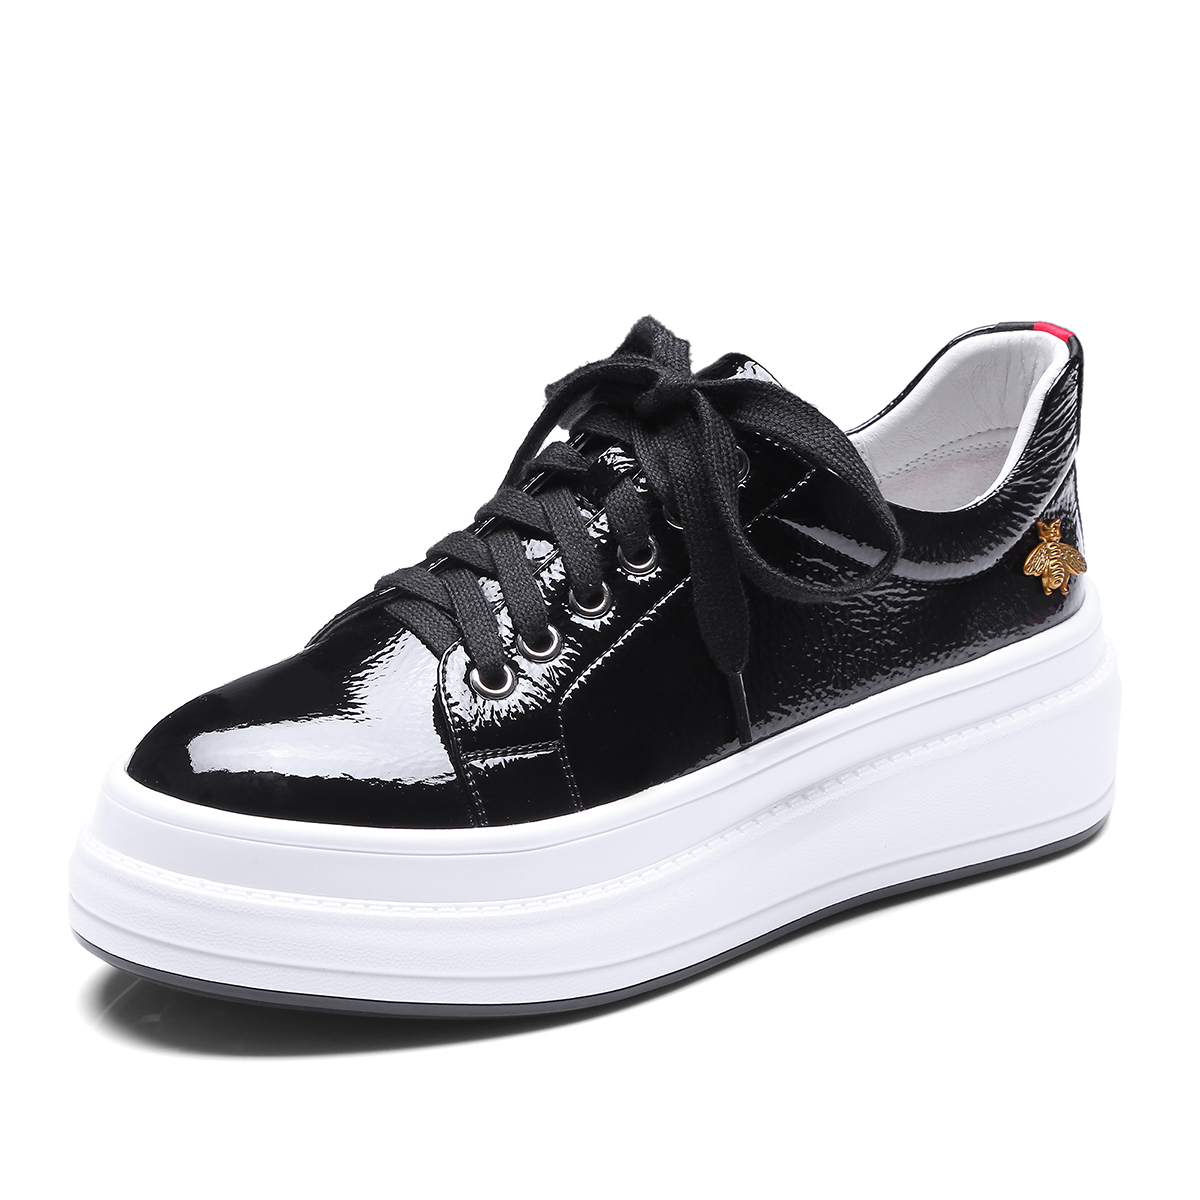 INDACO 2019 femmes baskets cuir blanc chaussures femme chaussures mode 34-40 - 4